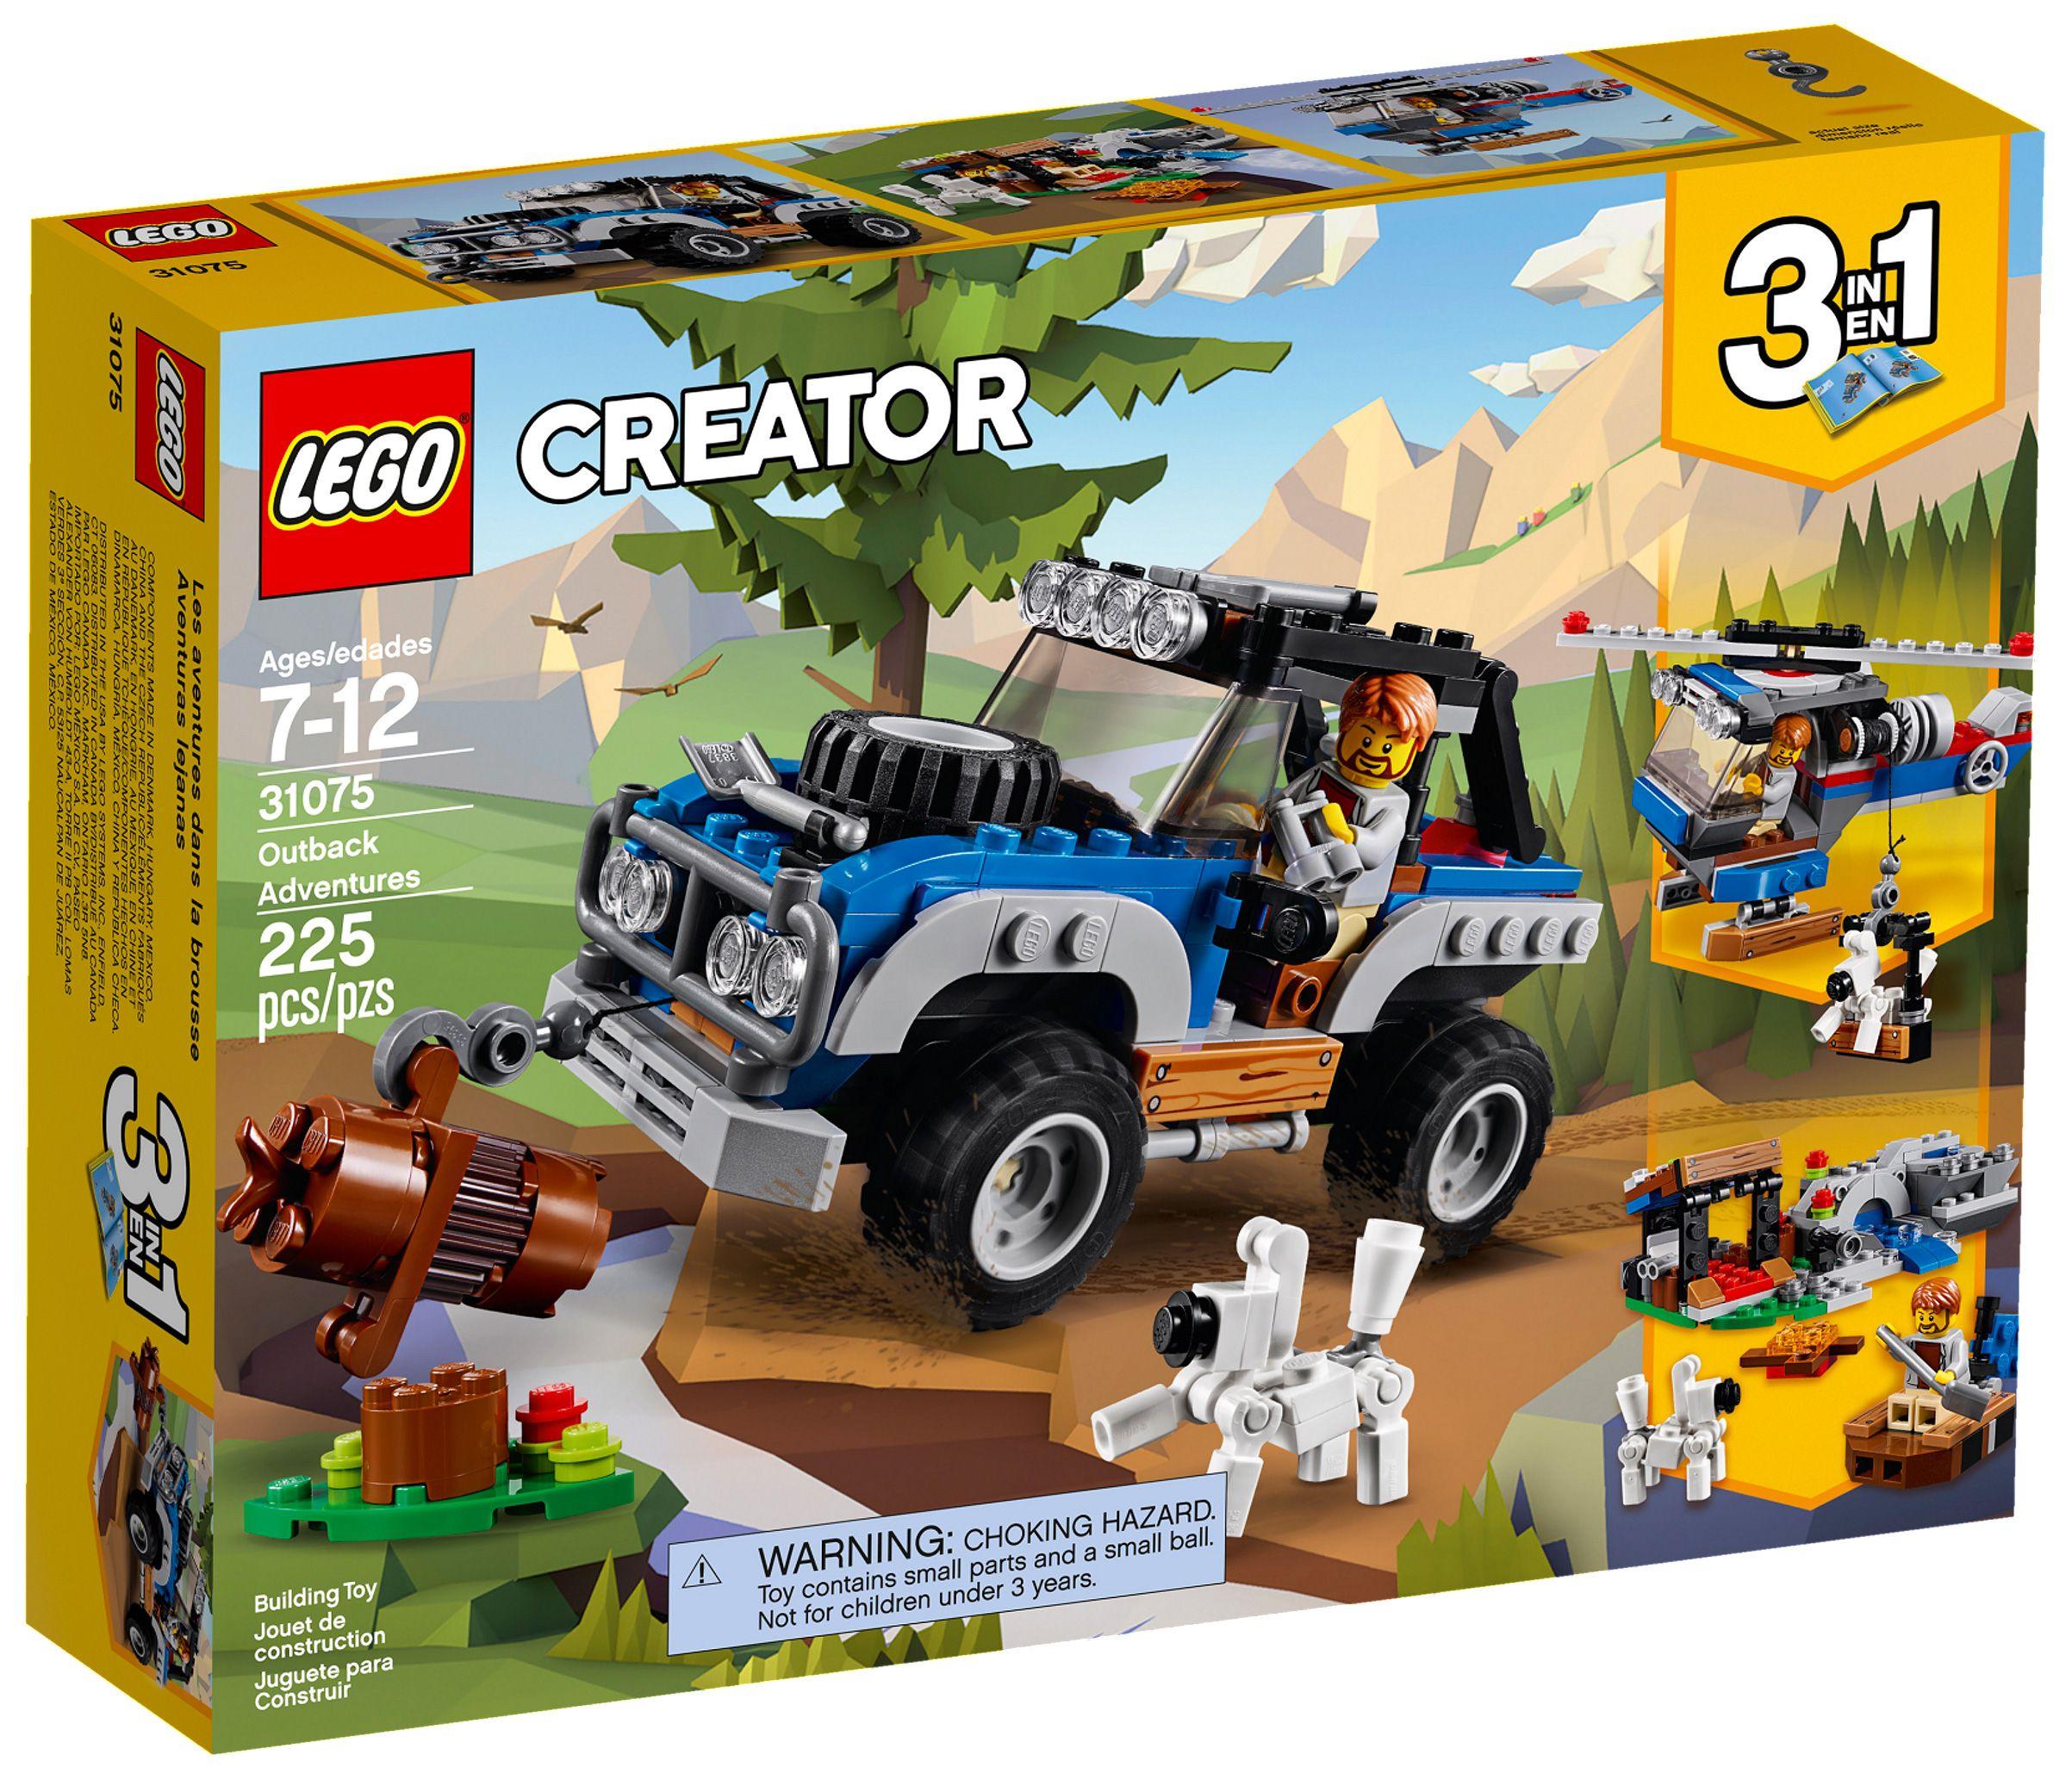 Lego Creator 31075 Pas Cher Les Aventures Tout Terrain Lego Idees Lego Pare Buffle